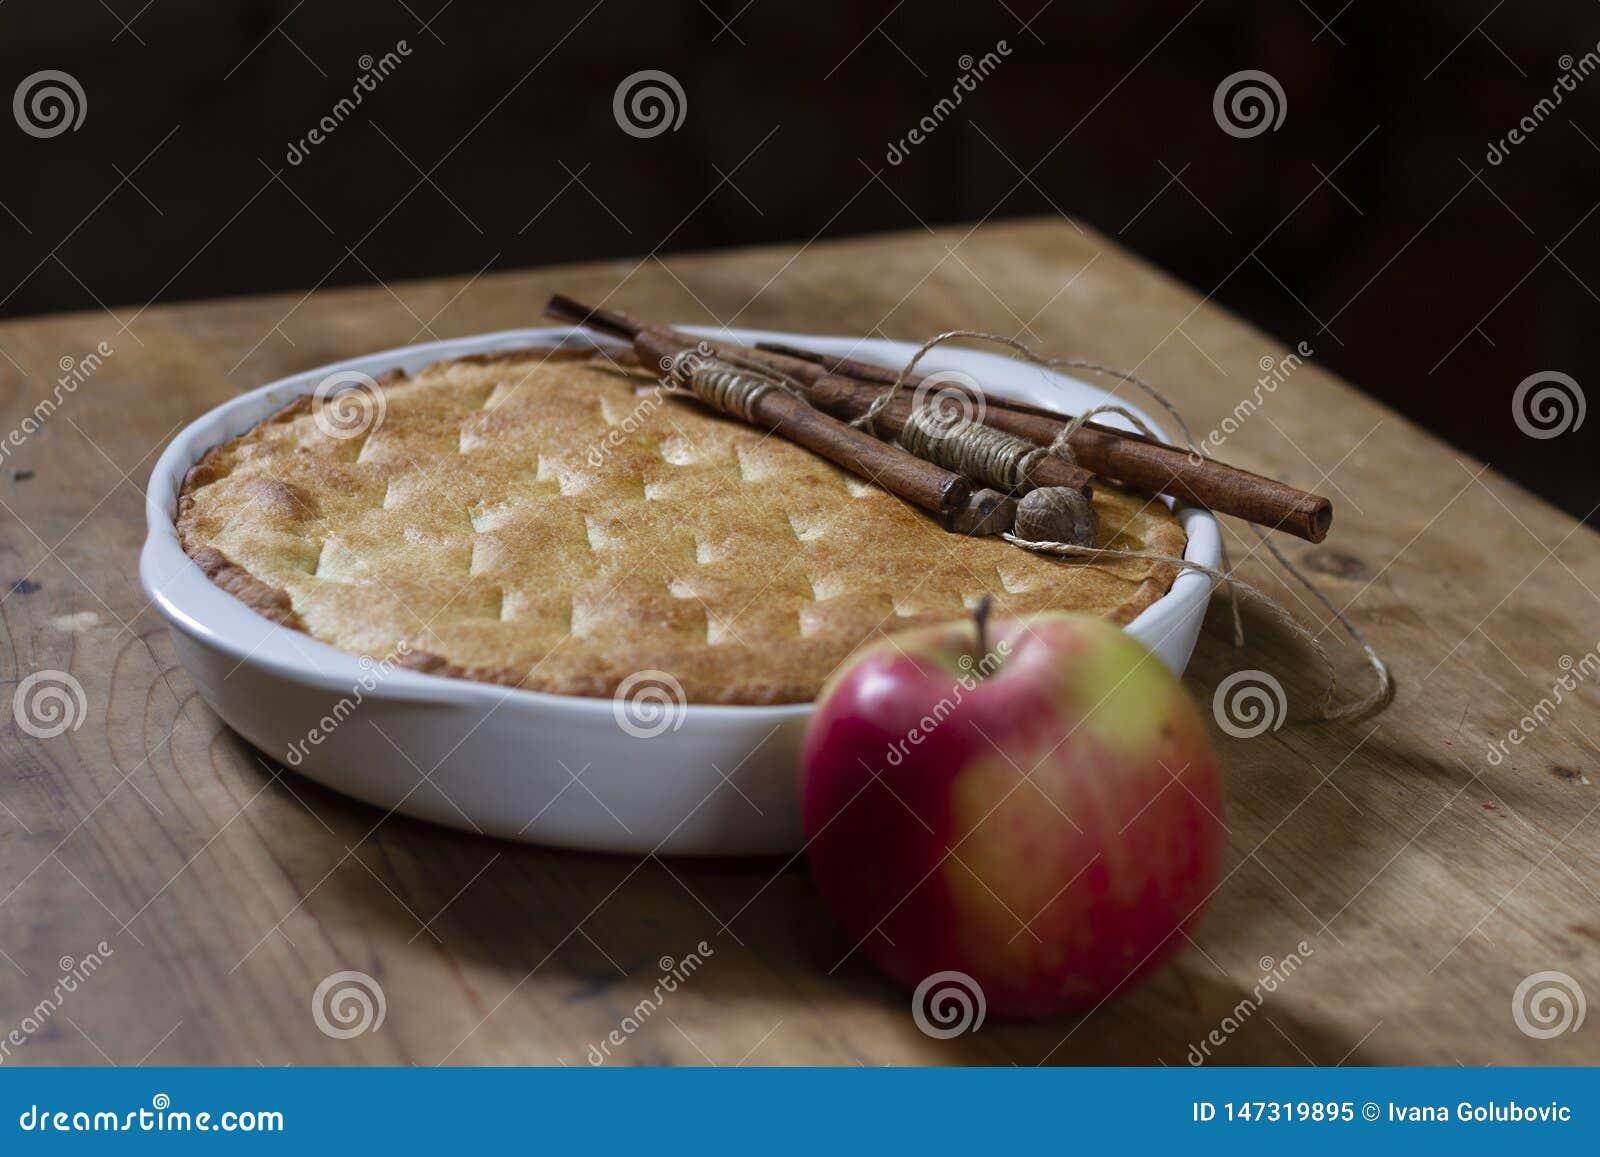 Apple pie in a white ceramic baking dish with cinnamon sticks